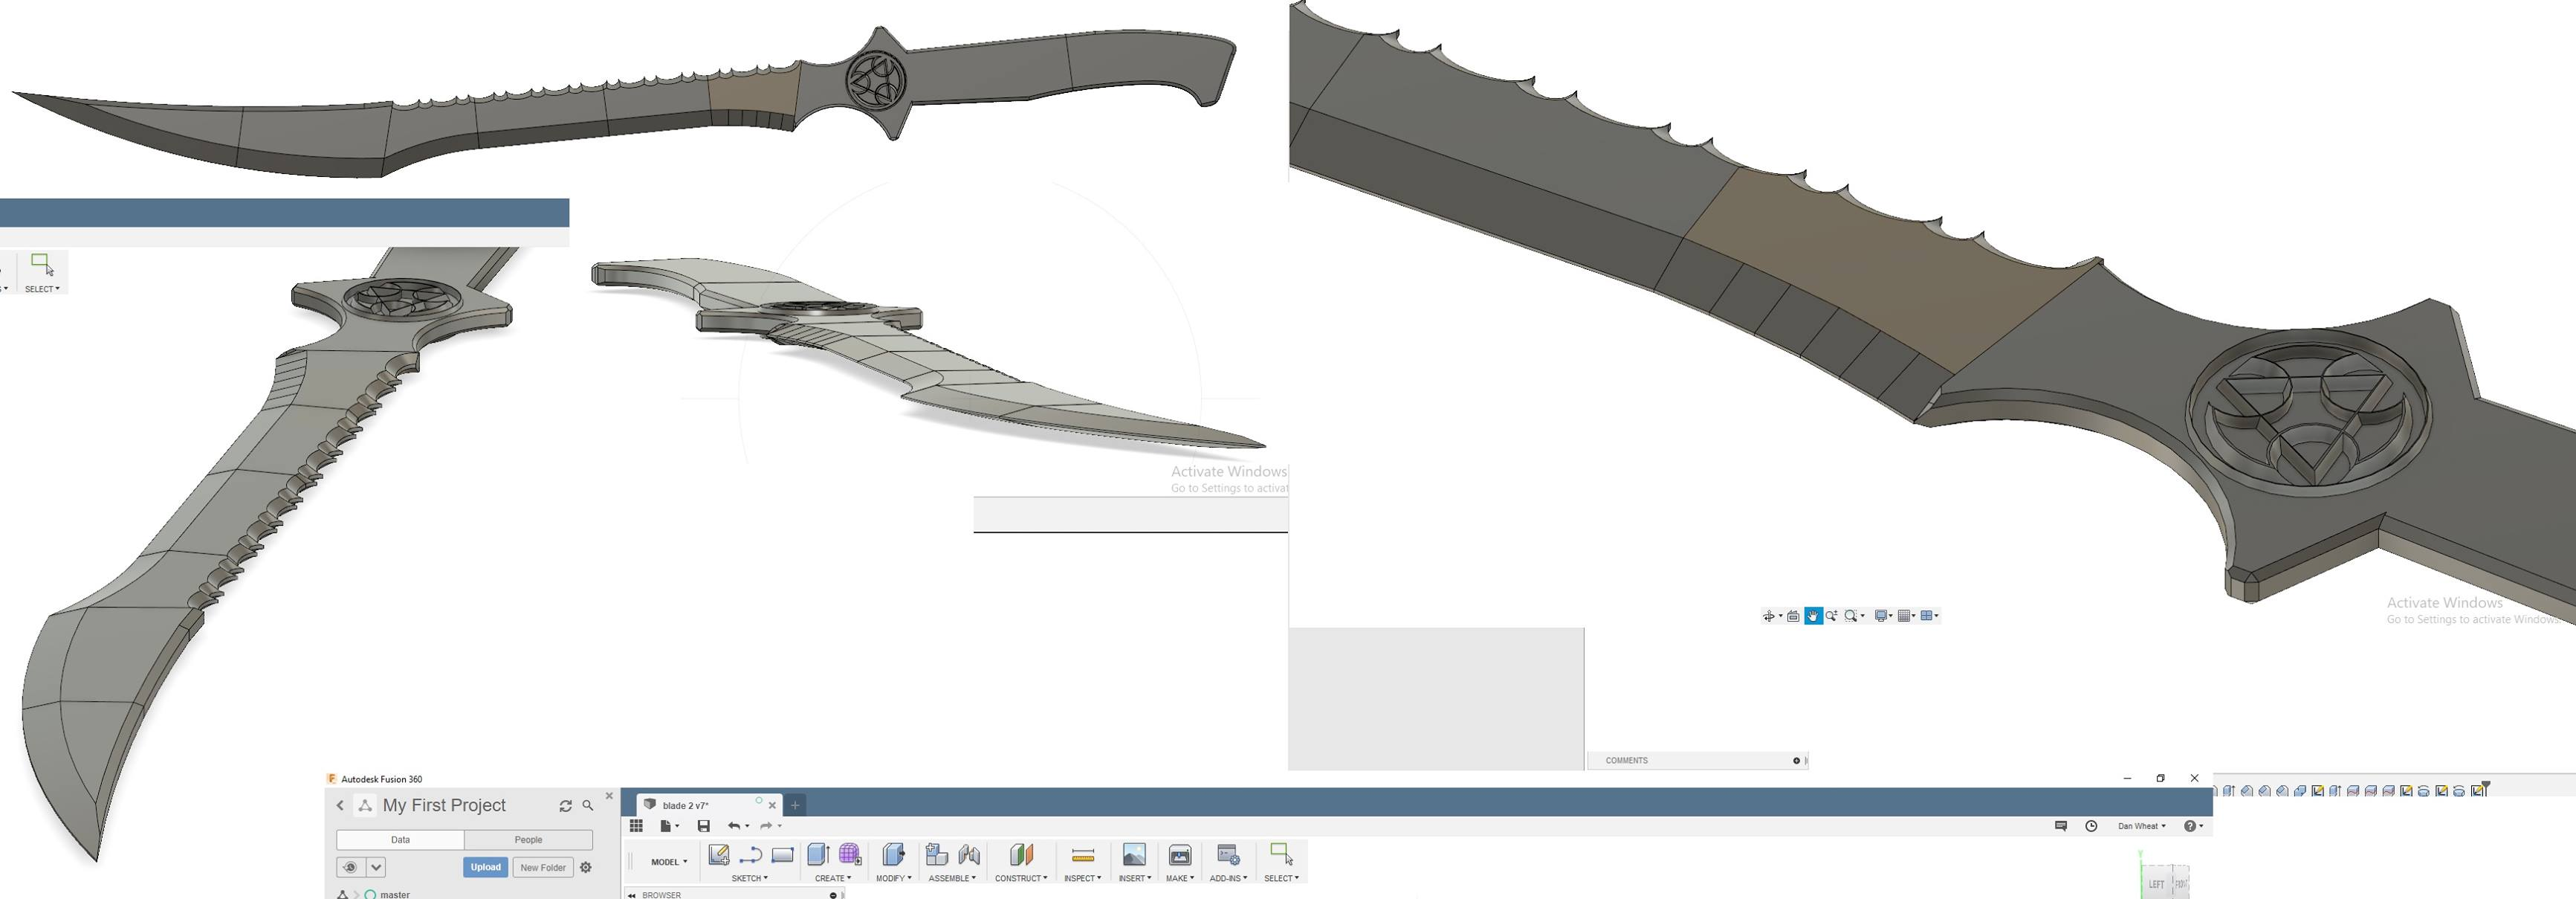 sword design.jpg